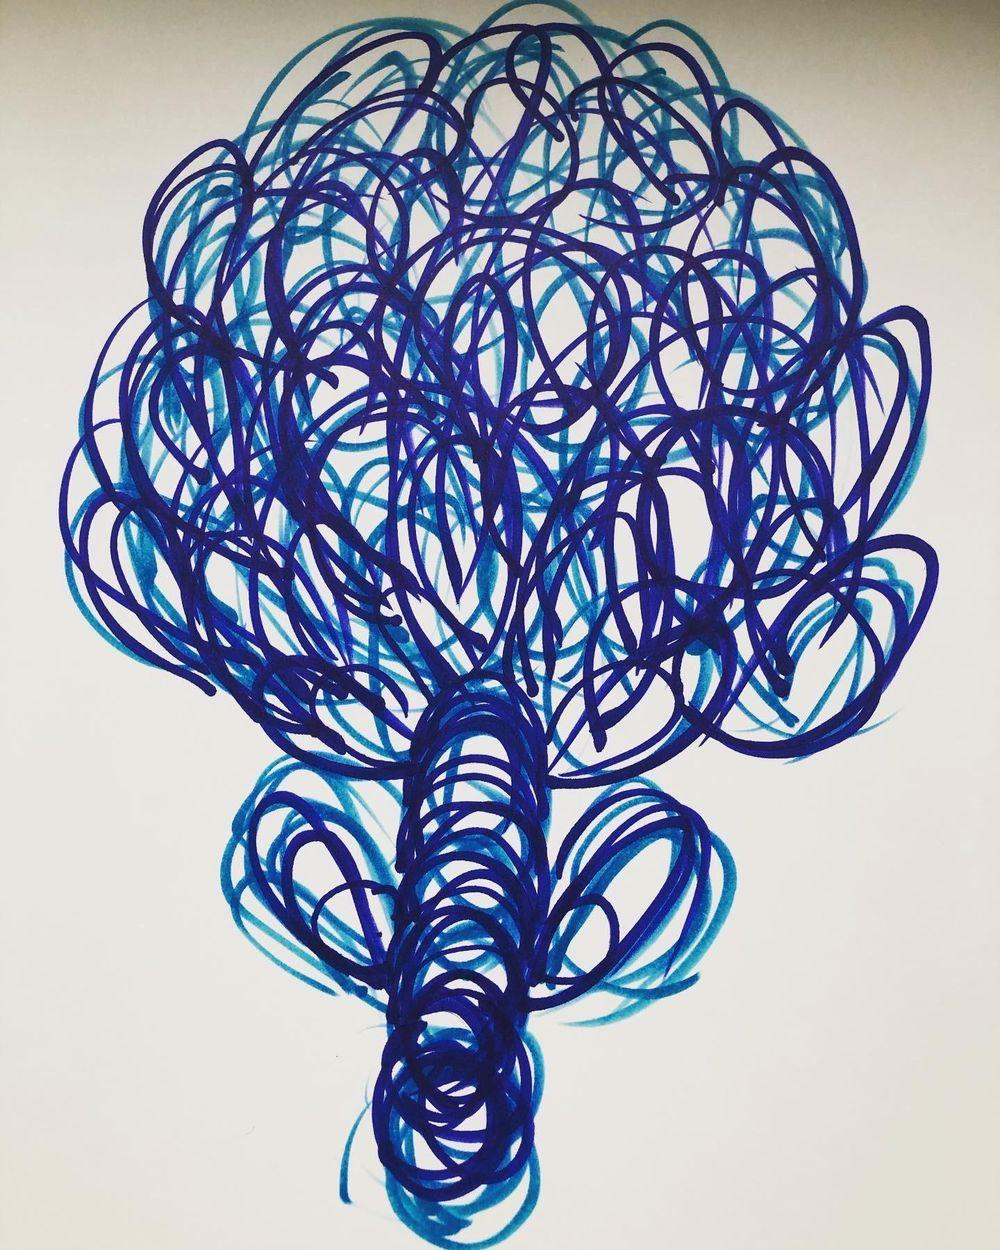 Exploration - artichoke drawings - image 9 - student project